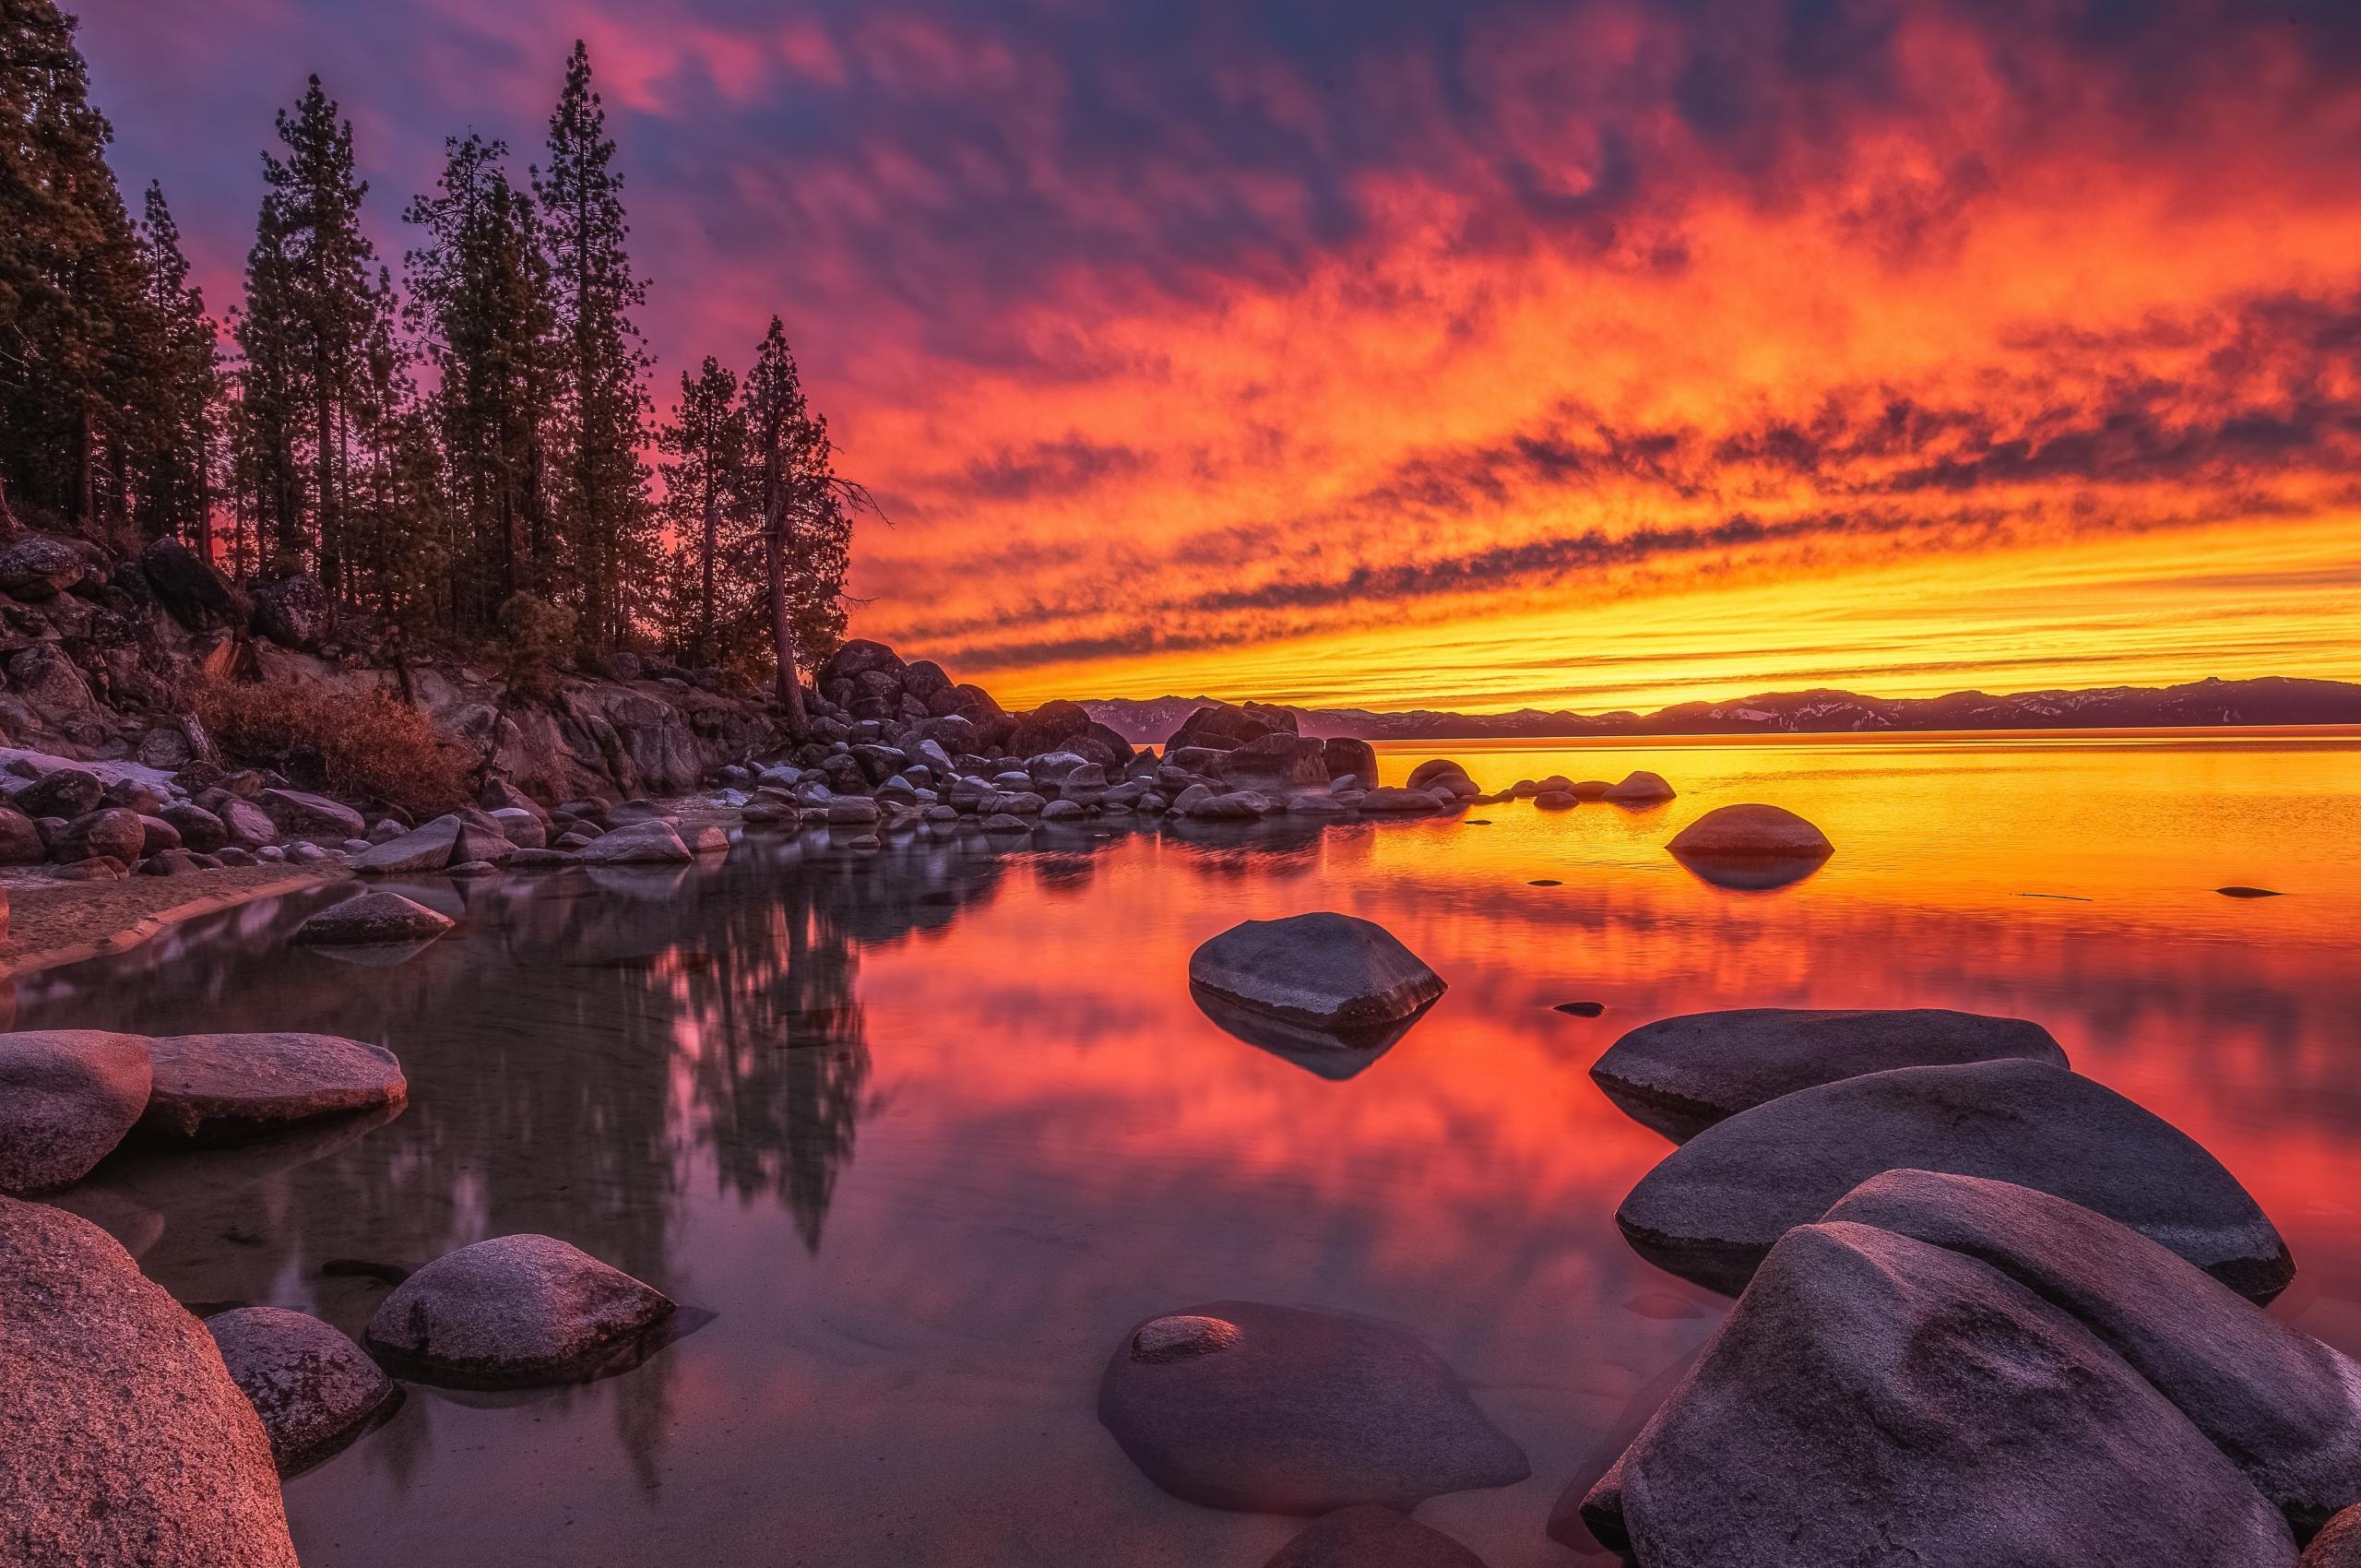 Lake Tahoe Nevada Wallpaper in 2560x1700 Resolution